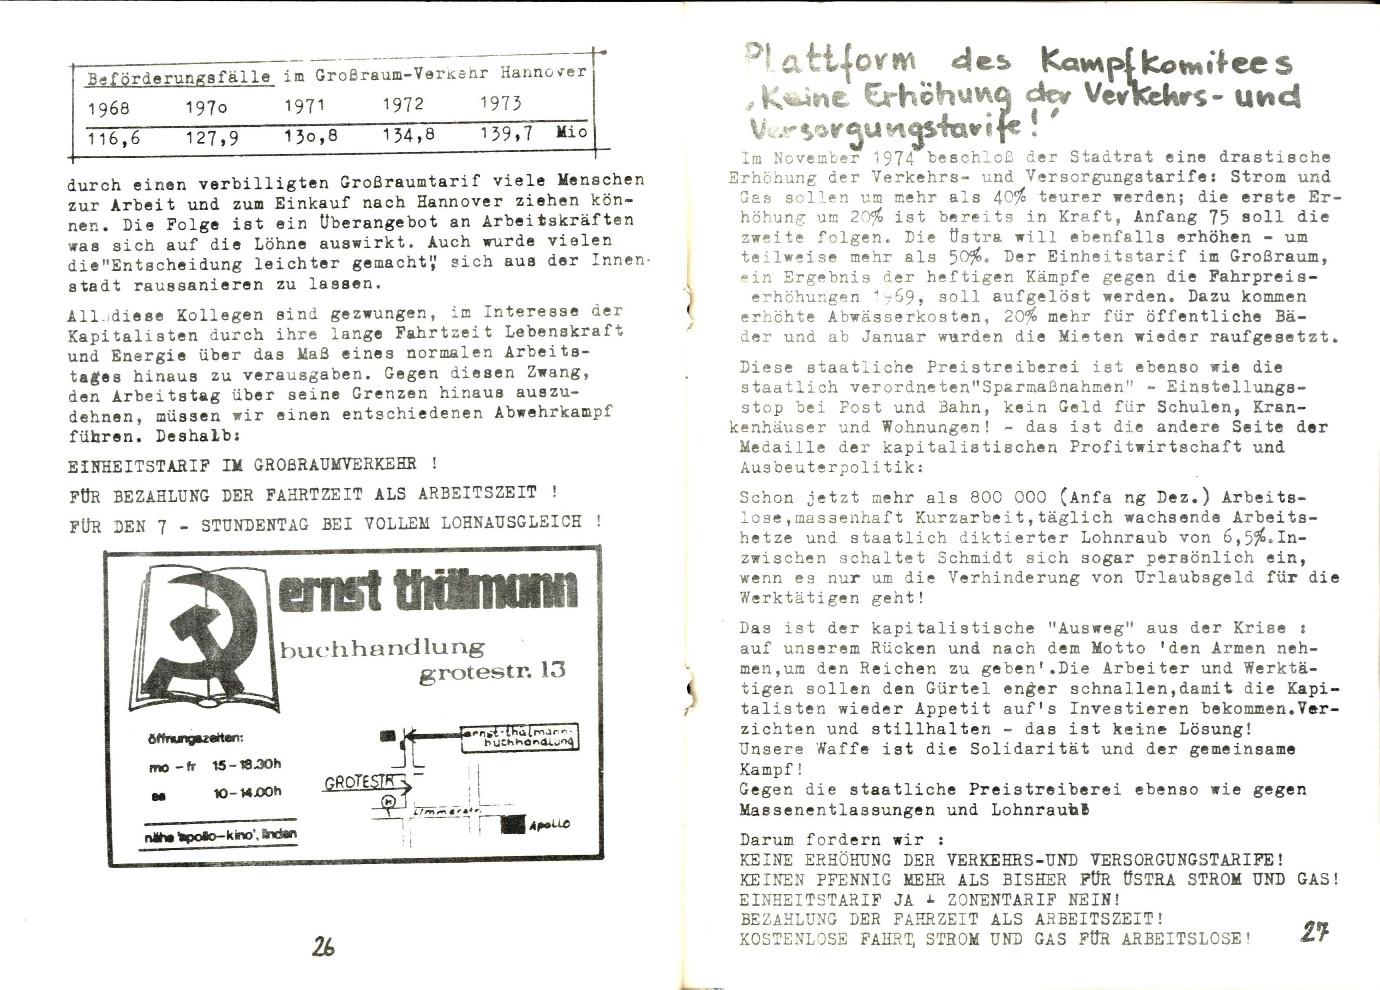 Hannover_AO_1975_Fahrpreisboykott_17